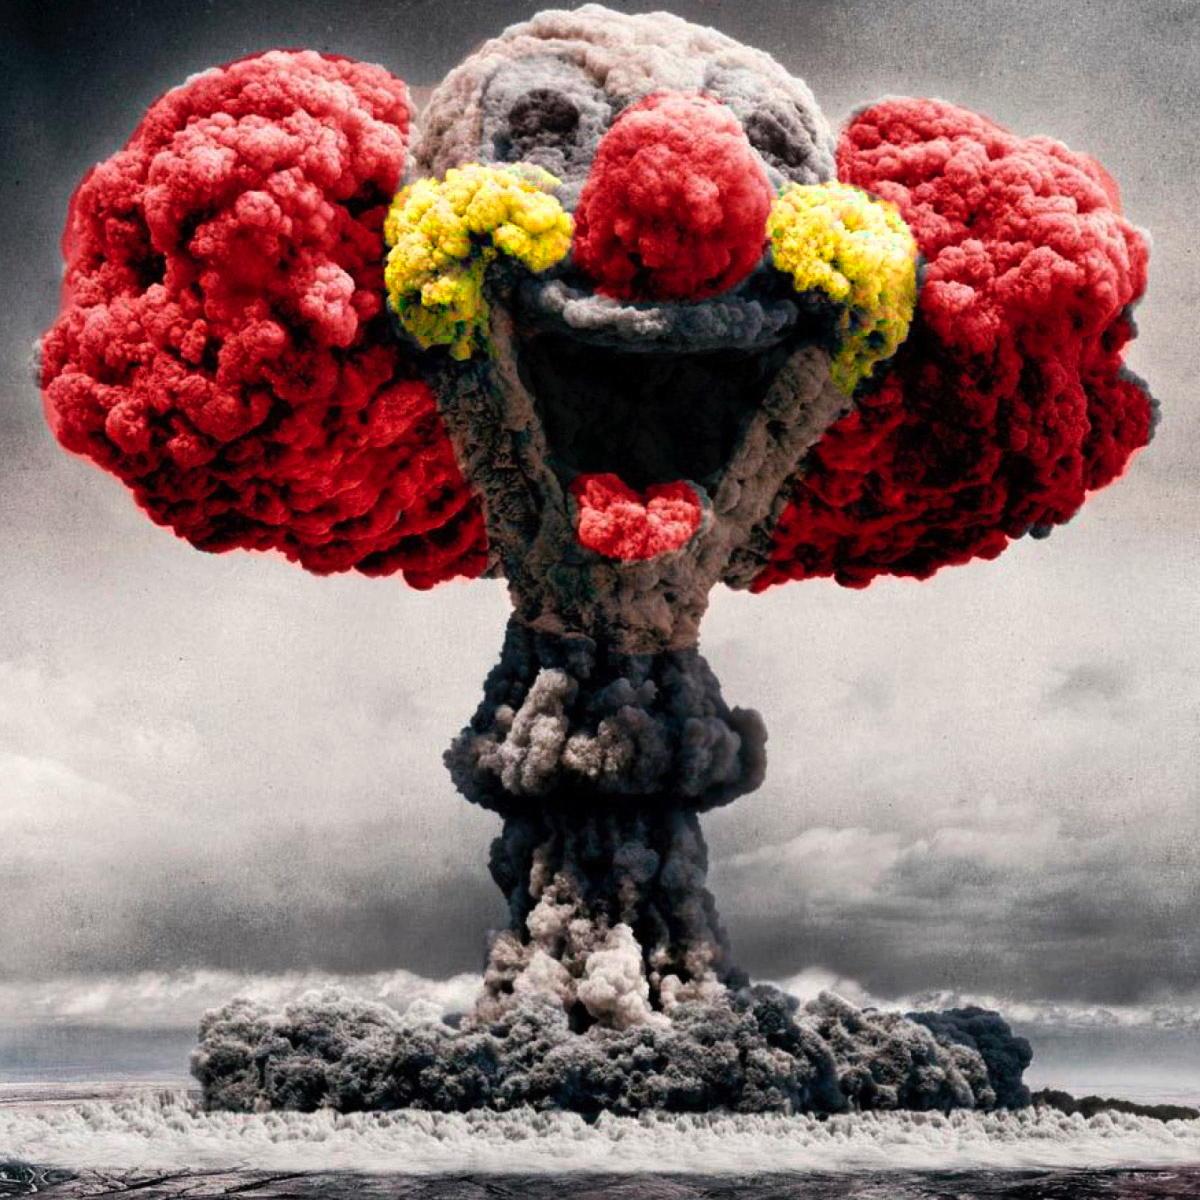 Atombombe atompilz clown lustige zerstoerung vernichtung wahnsinn deutsche atombombe israel atombombenbauer